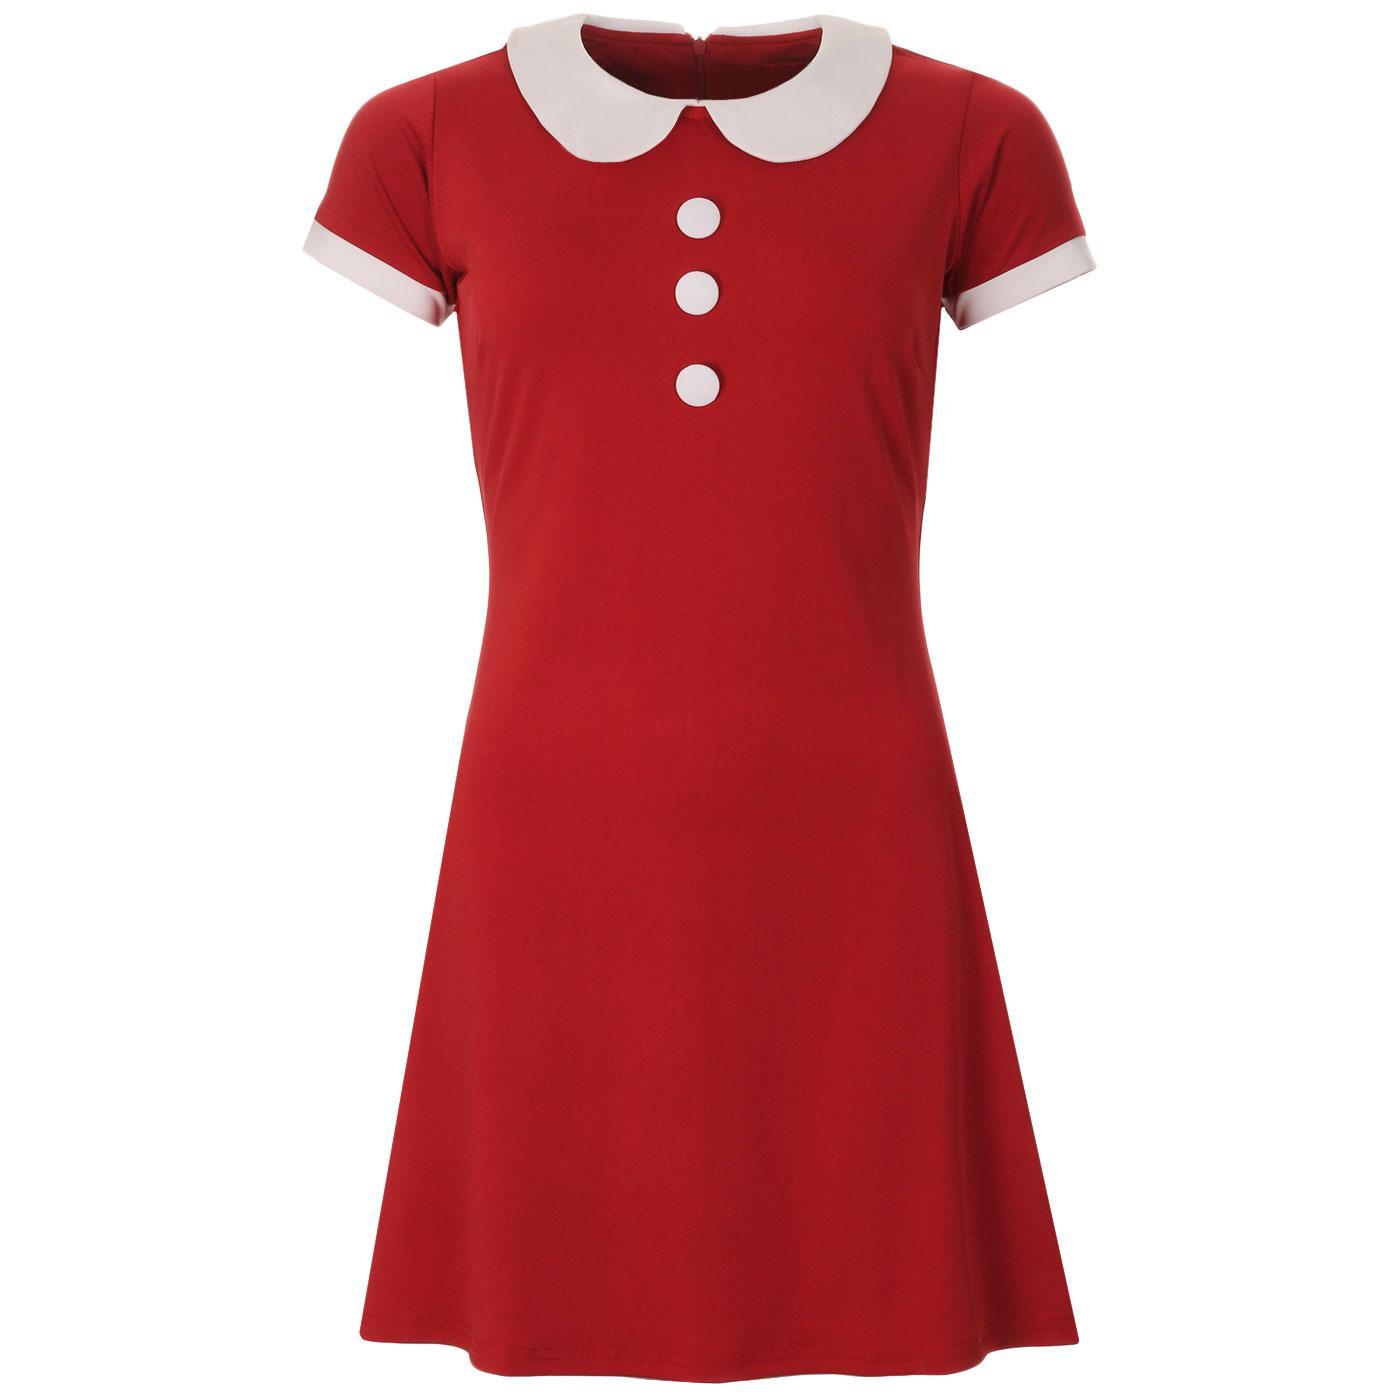 Madcap England Dollierocker 1960s Mod Peter Pan Collar Dress in Chilli Pepper Red